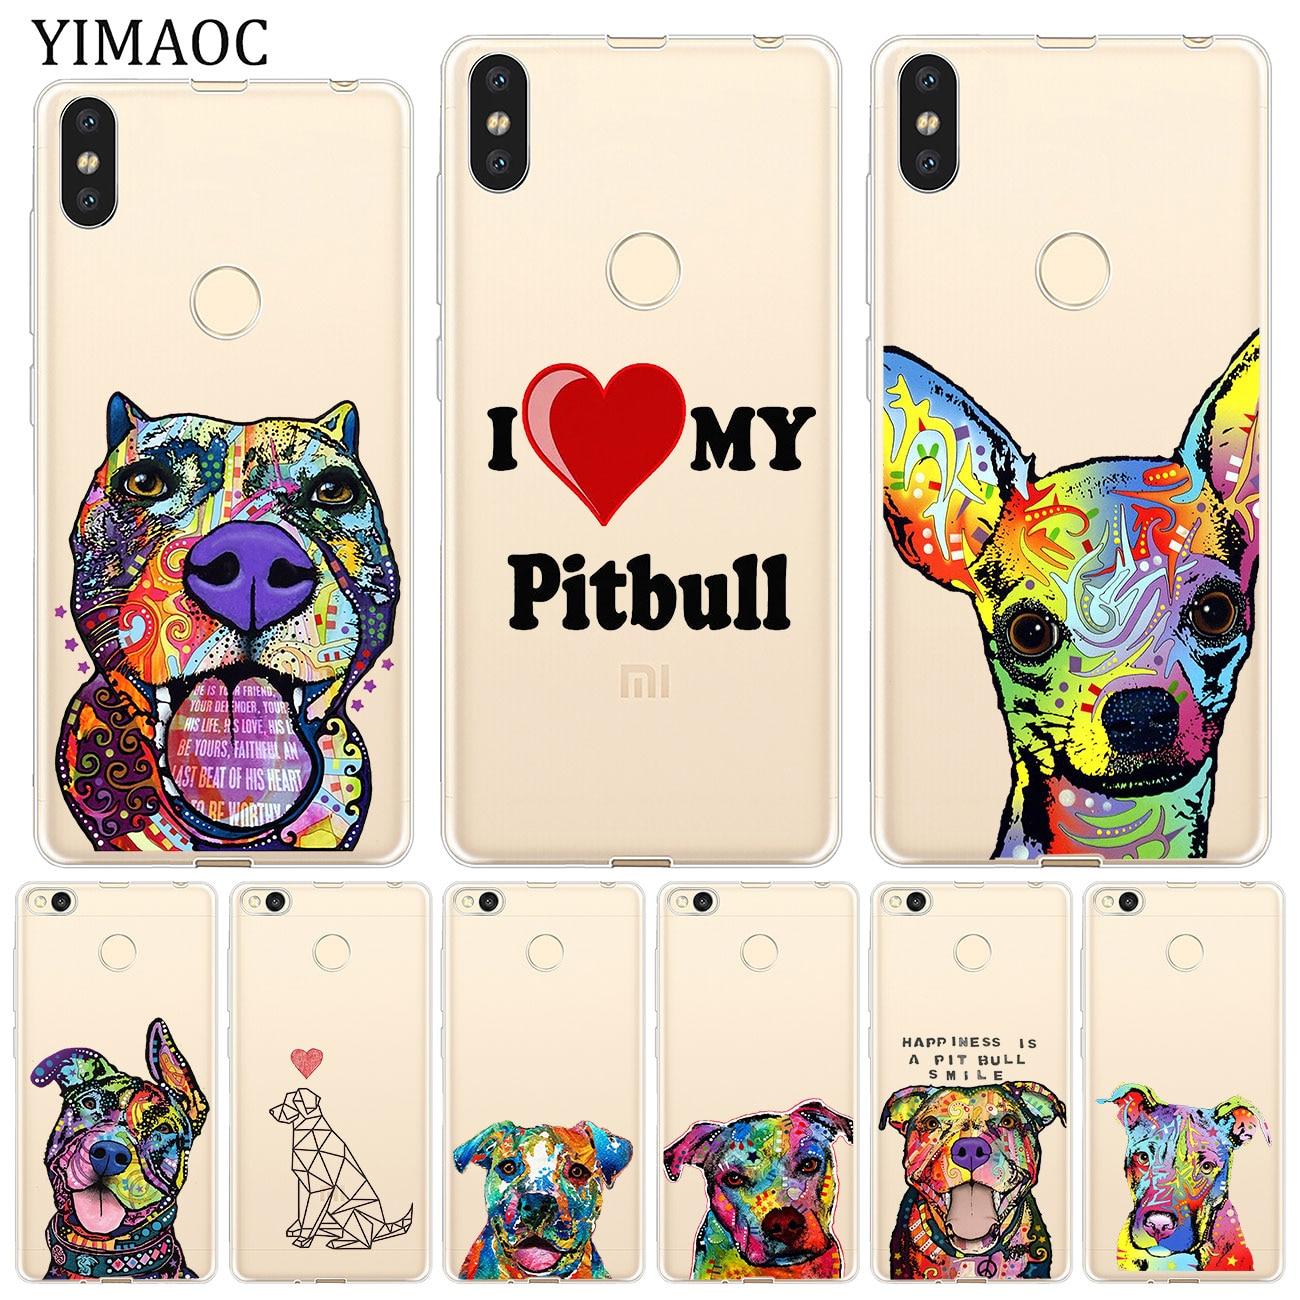 YIMAOC Pitbull dog Soft Silicone Phone Case for Xiaomi Mi 9 9T CC9 CC9E A3 Pro 8 SE A2 Lite A1 MiX 2